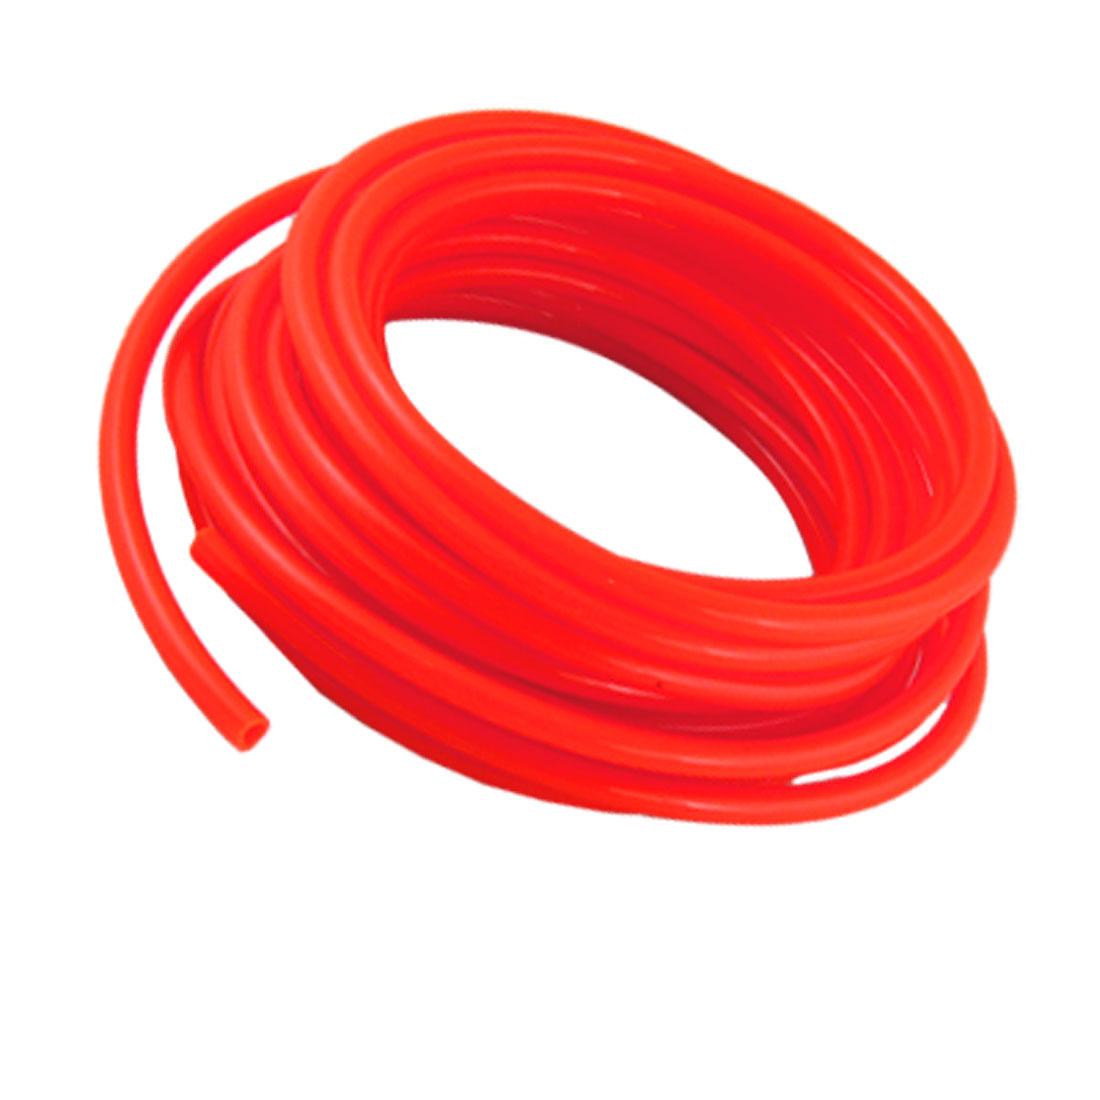 Orange Red 10M 32.8Ft 8mm OD 5mm ID Polyurethane PU Air Tube Hose